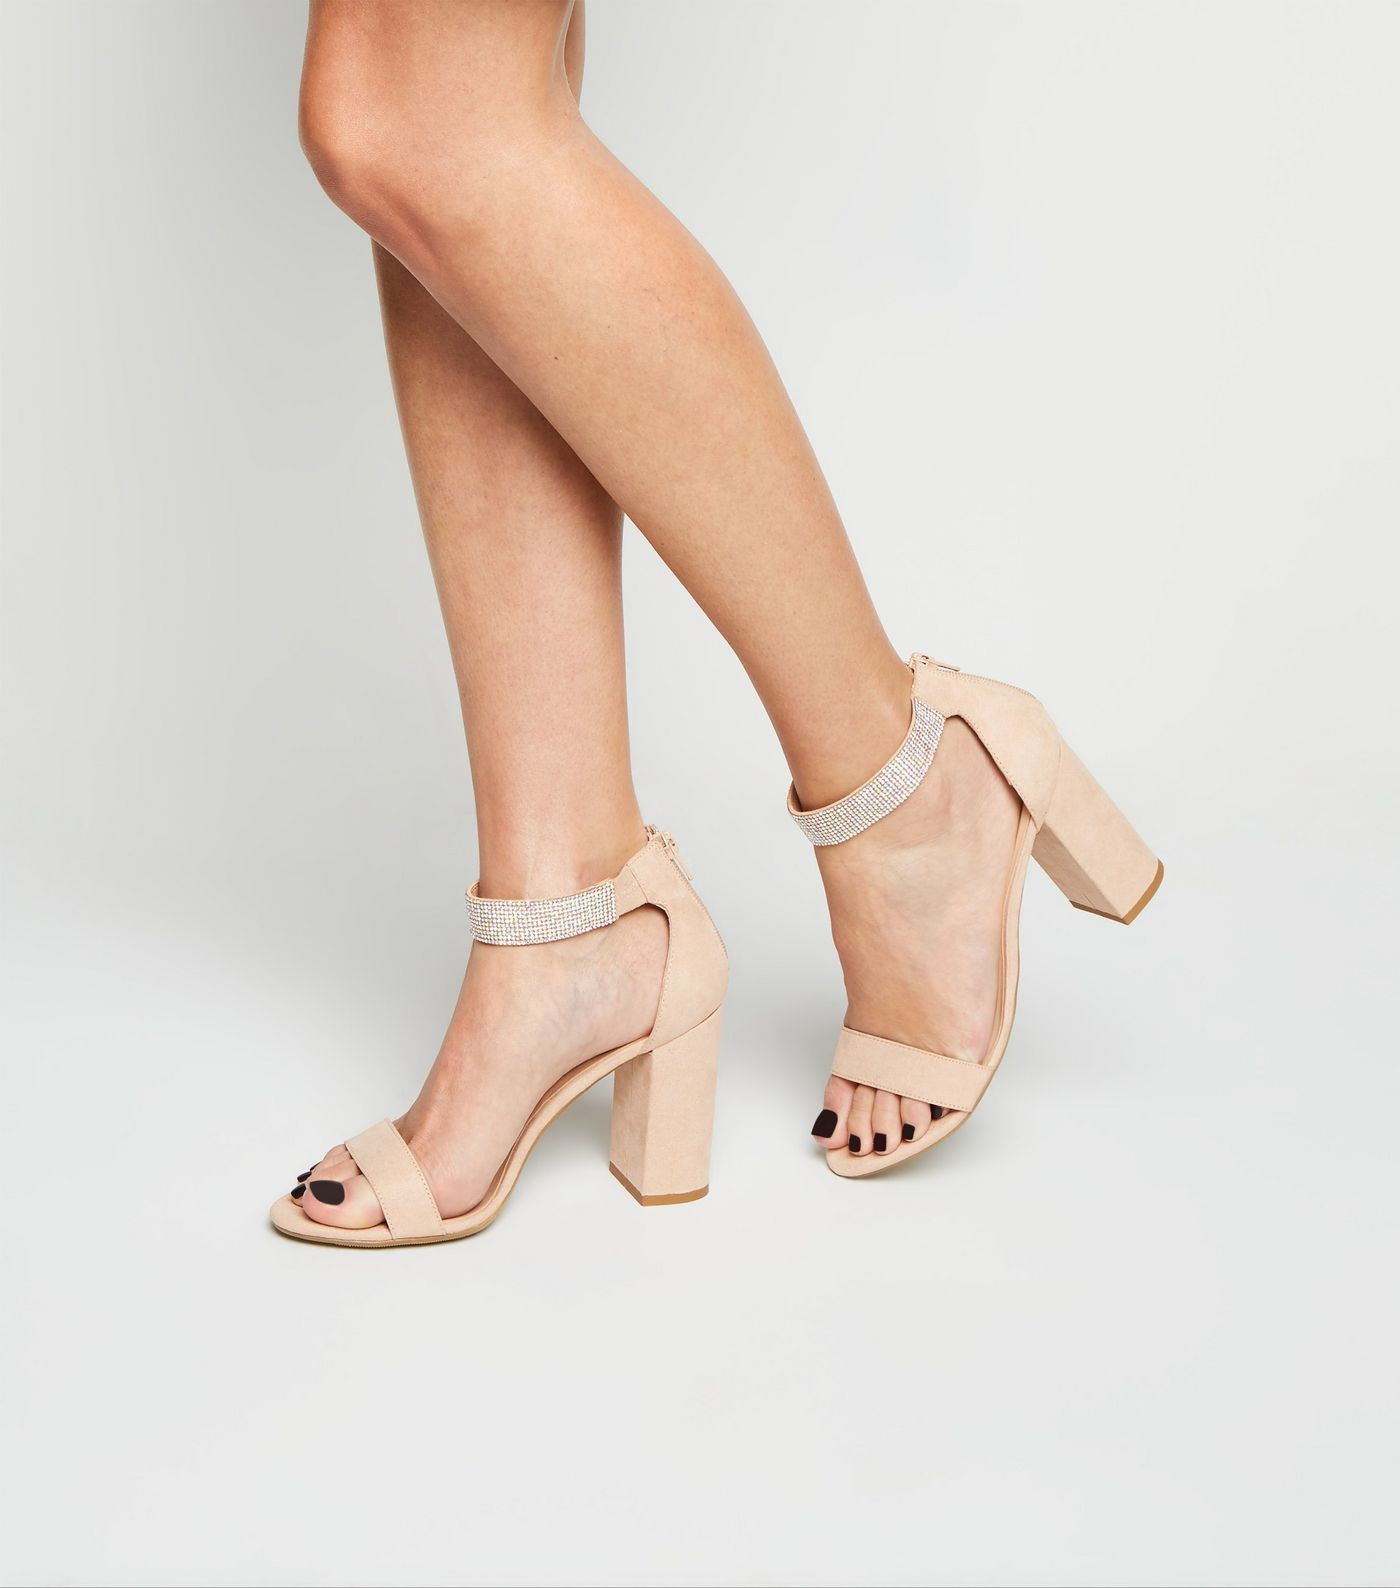 Wide Fit Cream Diamante Strap Block Heel Sandals New Look Block Heels Sandal Sandals Heels Heels